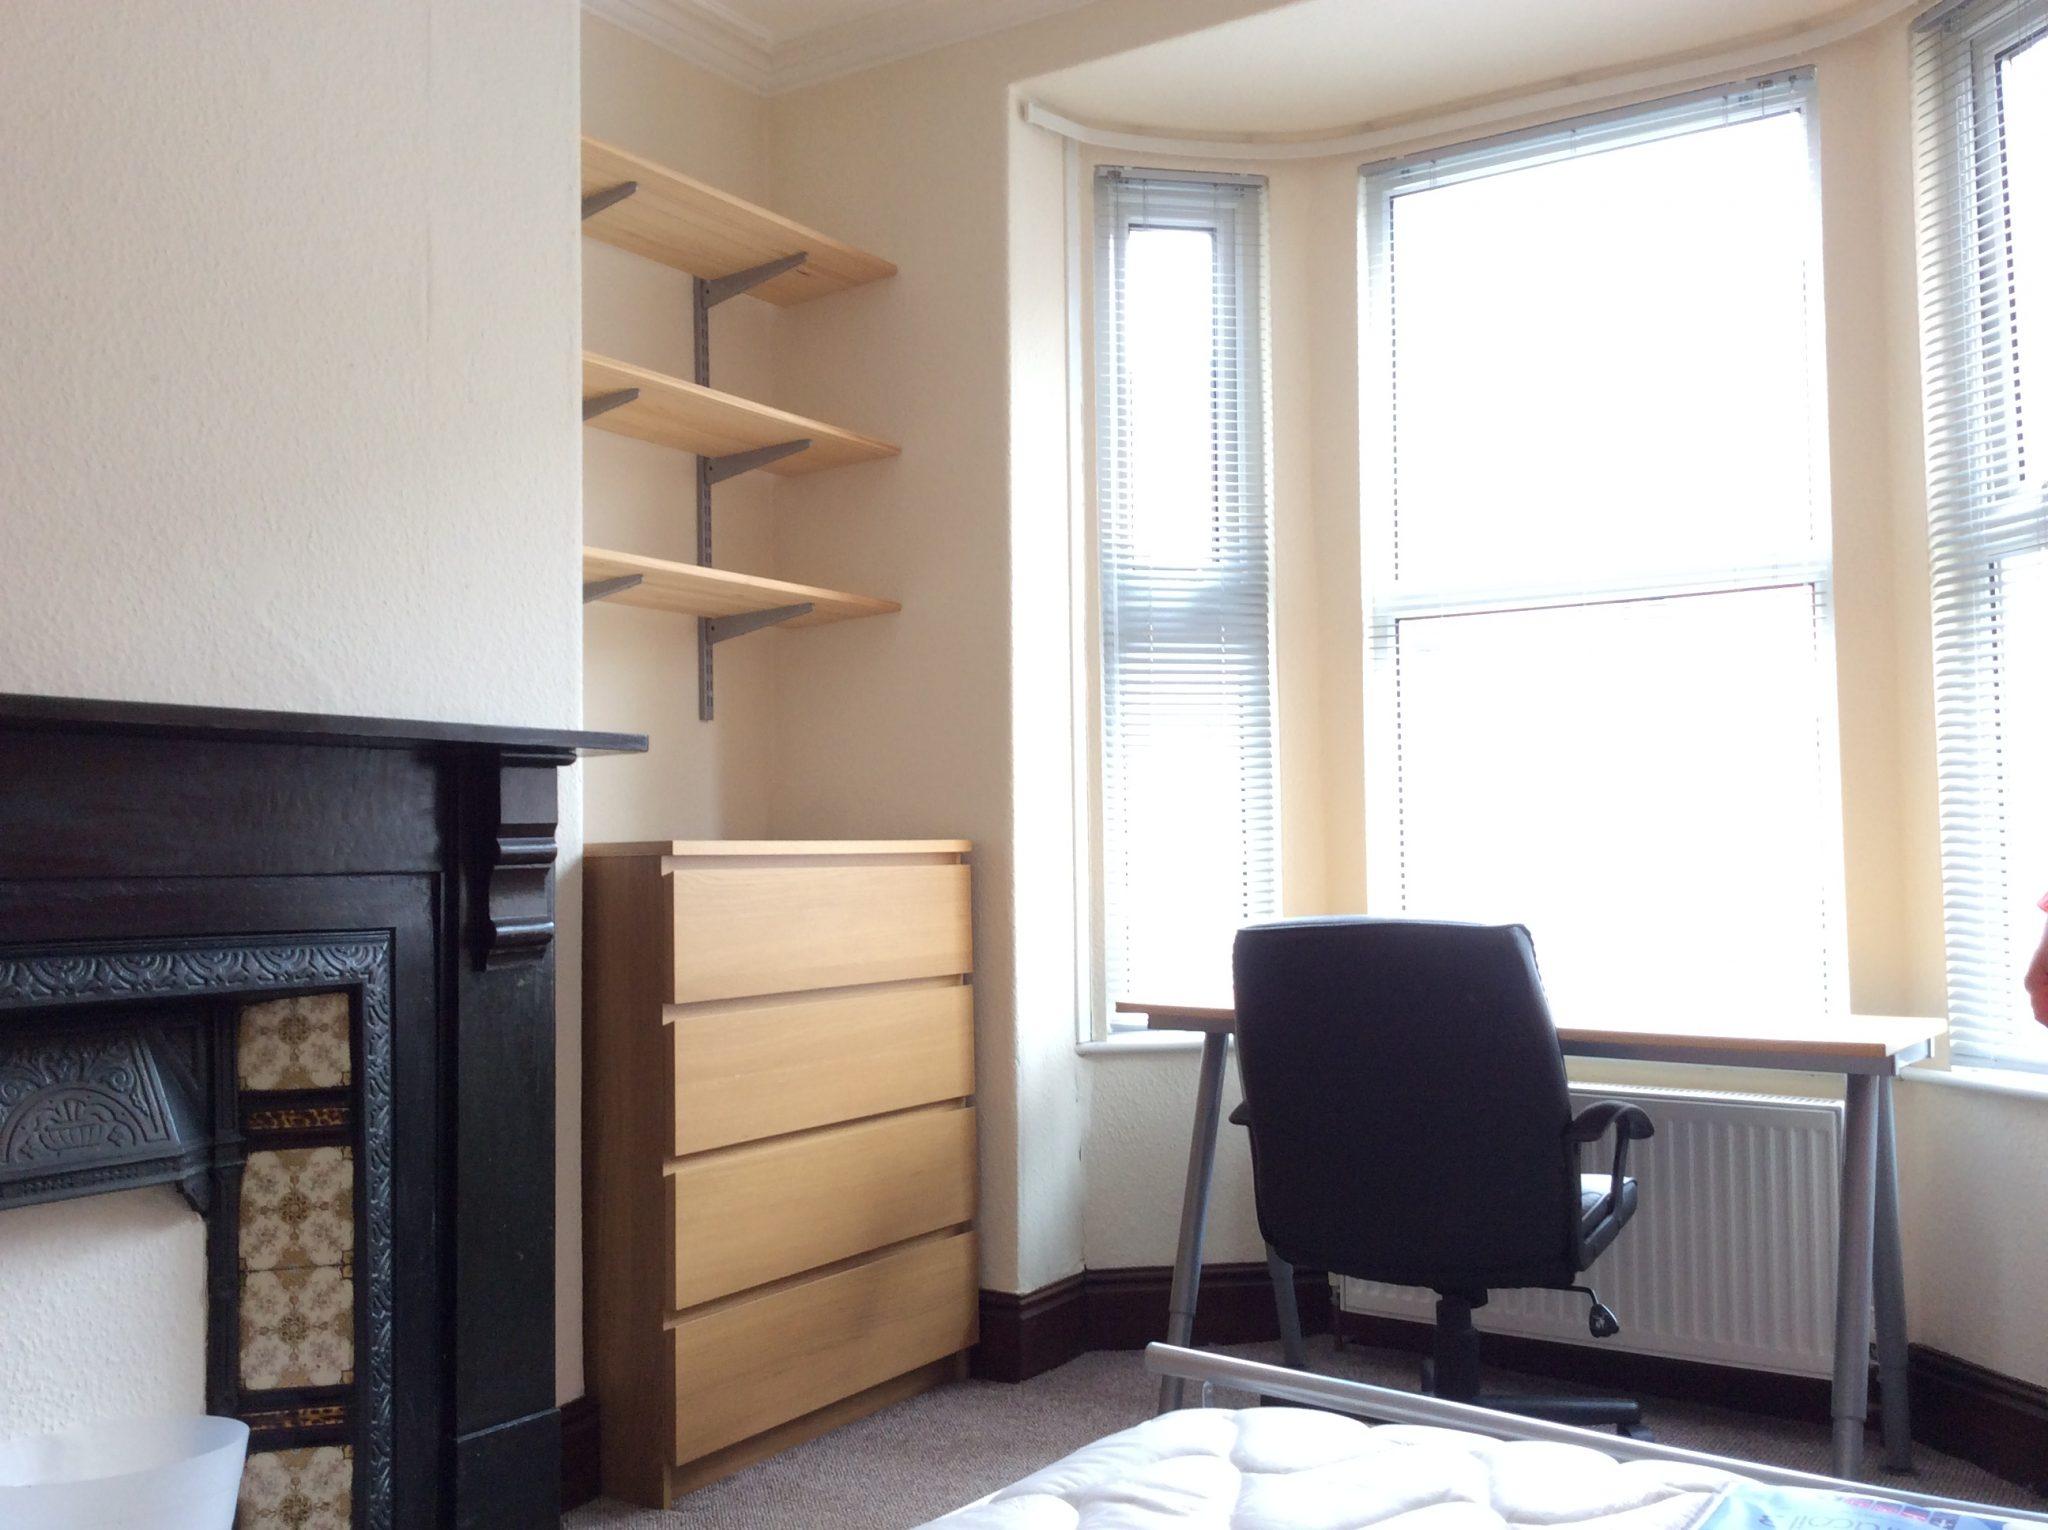 Abbot Street – 5 Bed